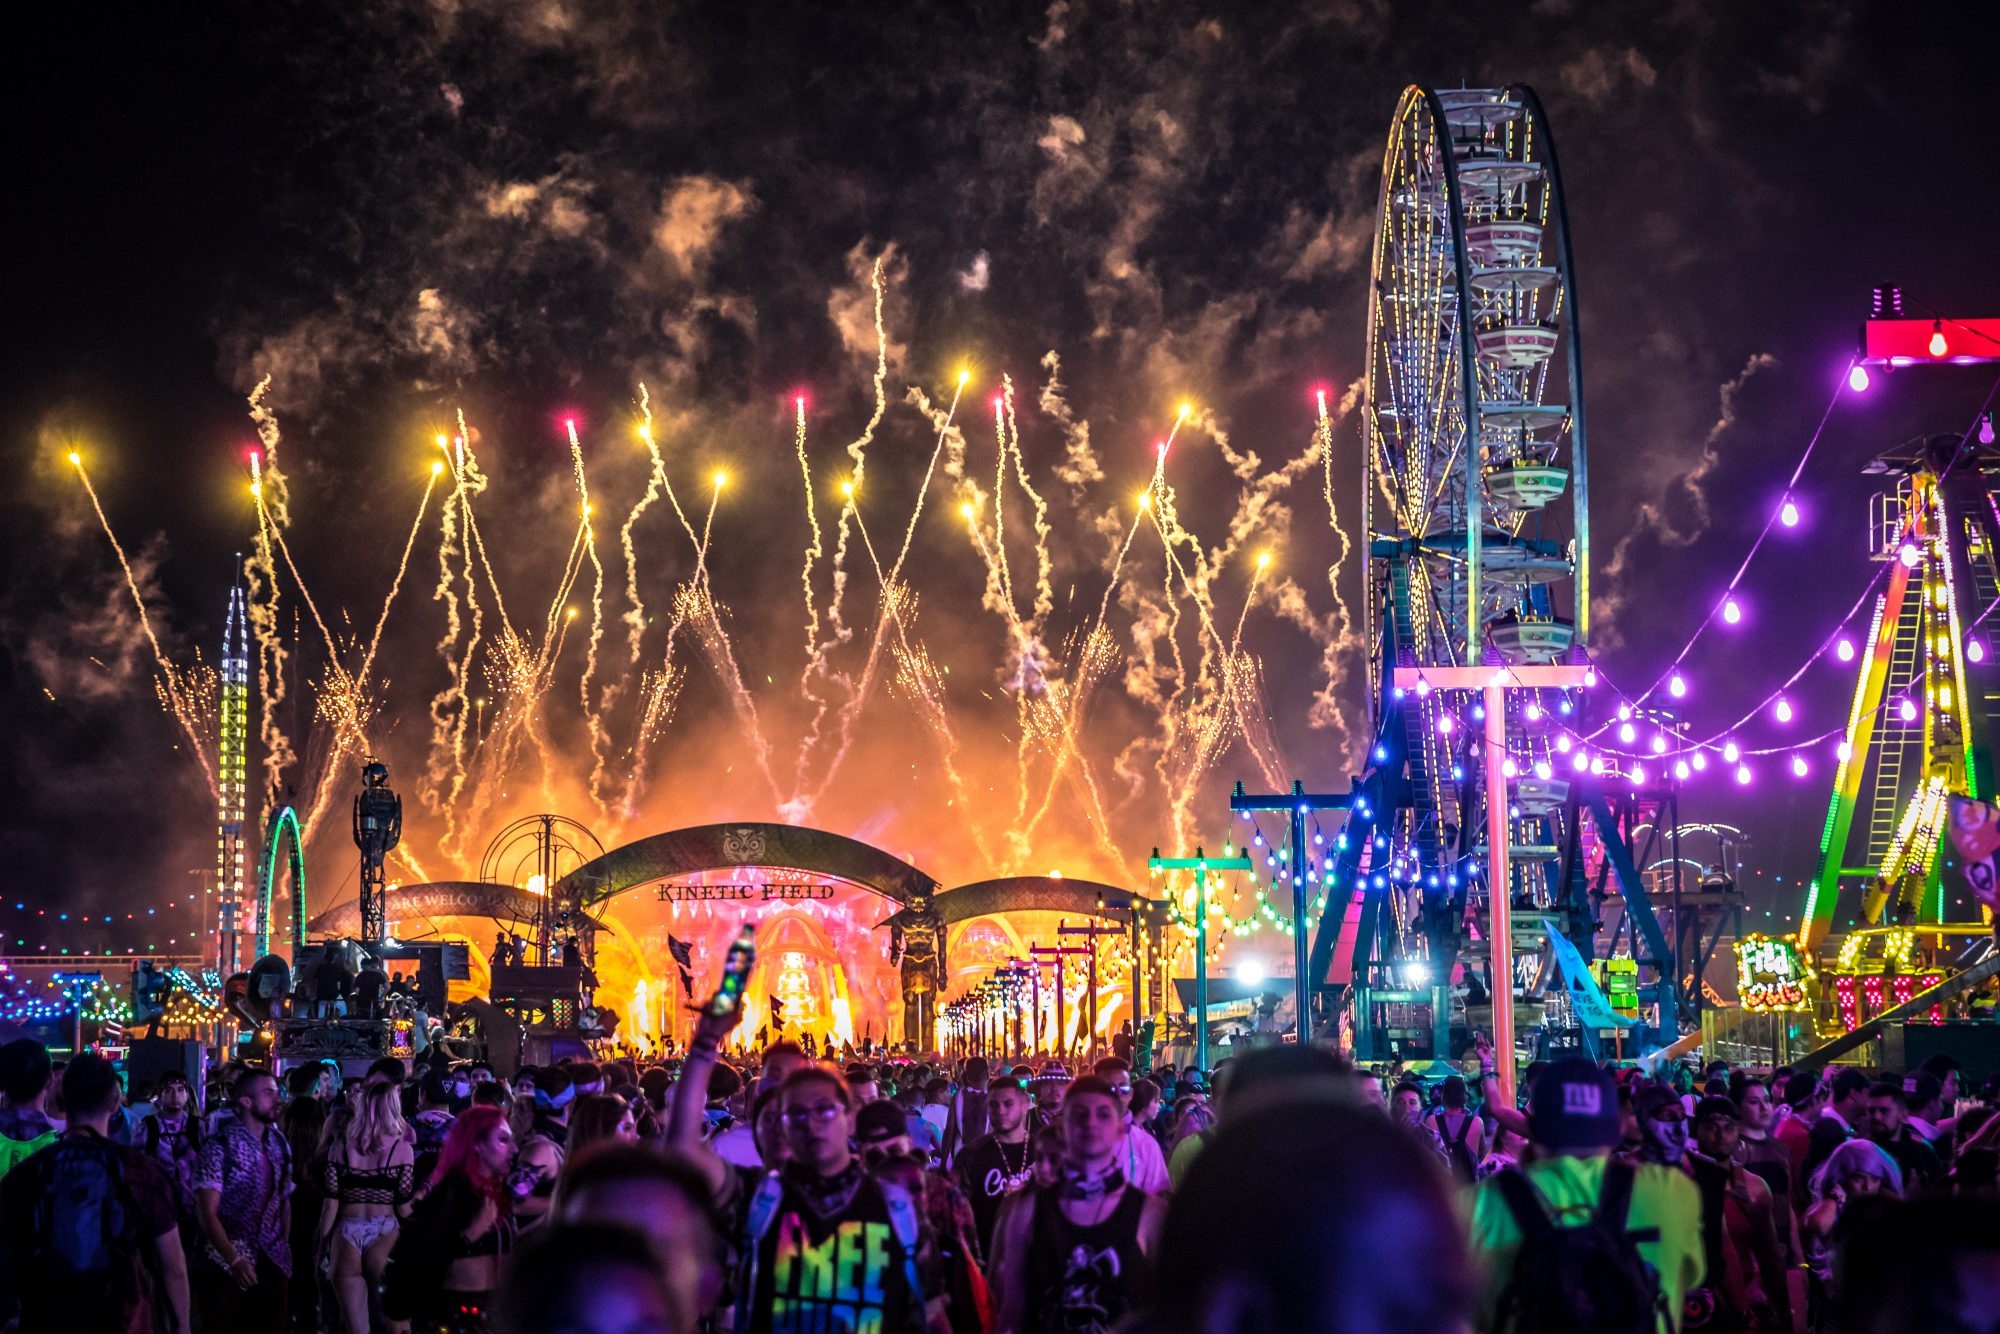 Speed dating las vegas 2019 fireworks